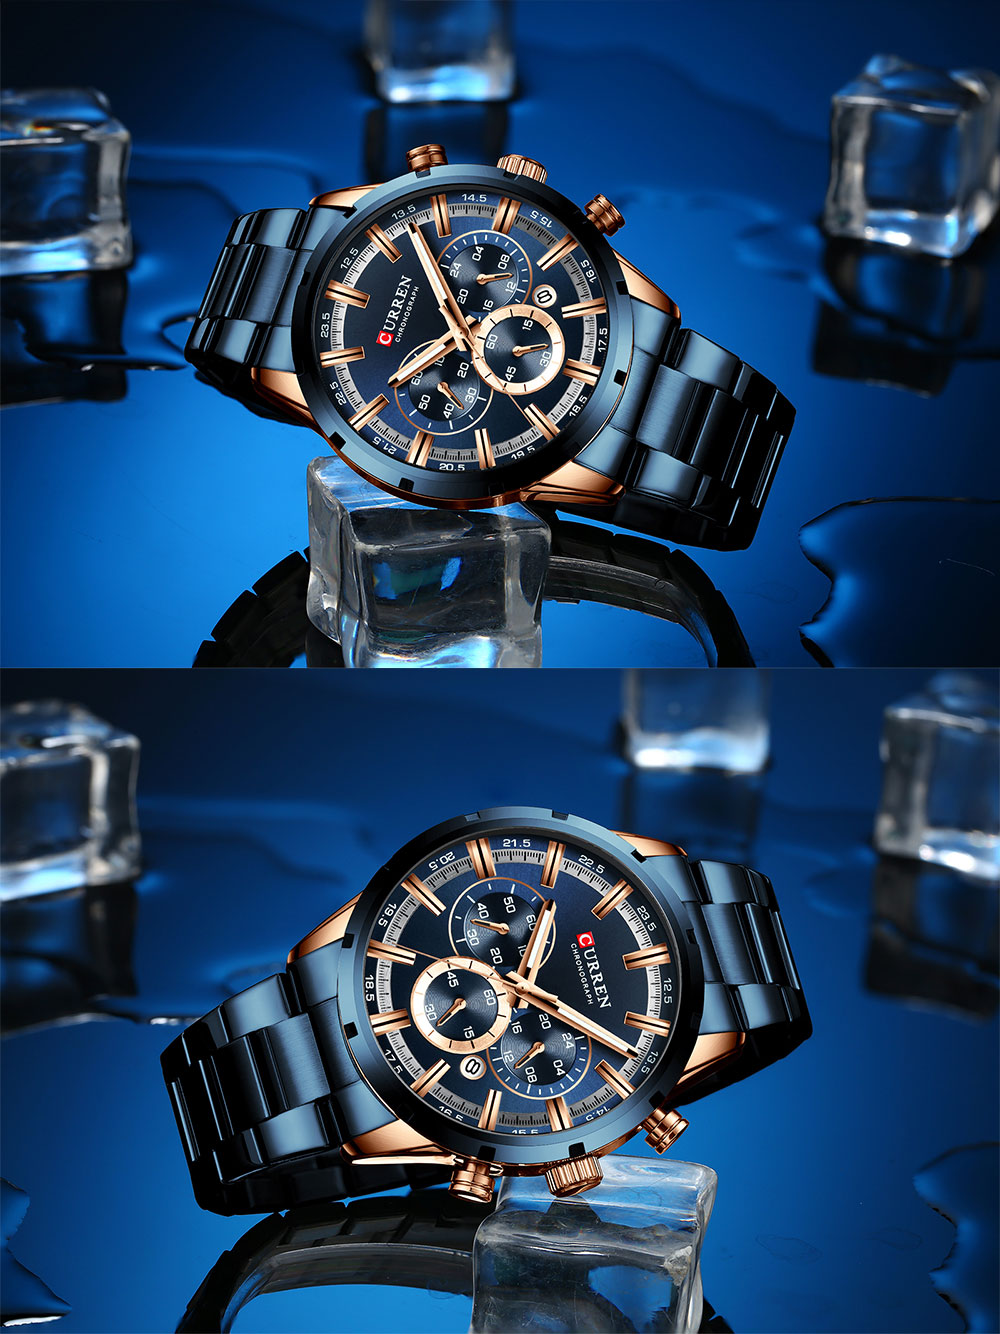 H7c1a397a2f5f4961b1f24d185e4633eez CURREN New Fashion Mens Watches Quartz Chronograph